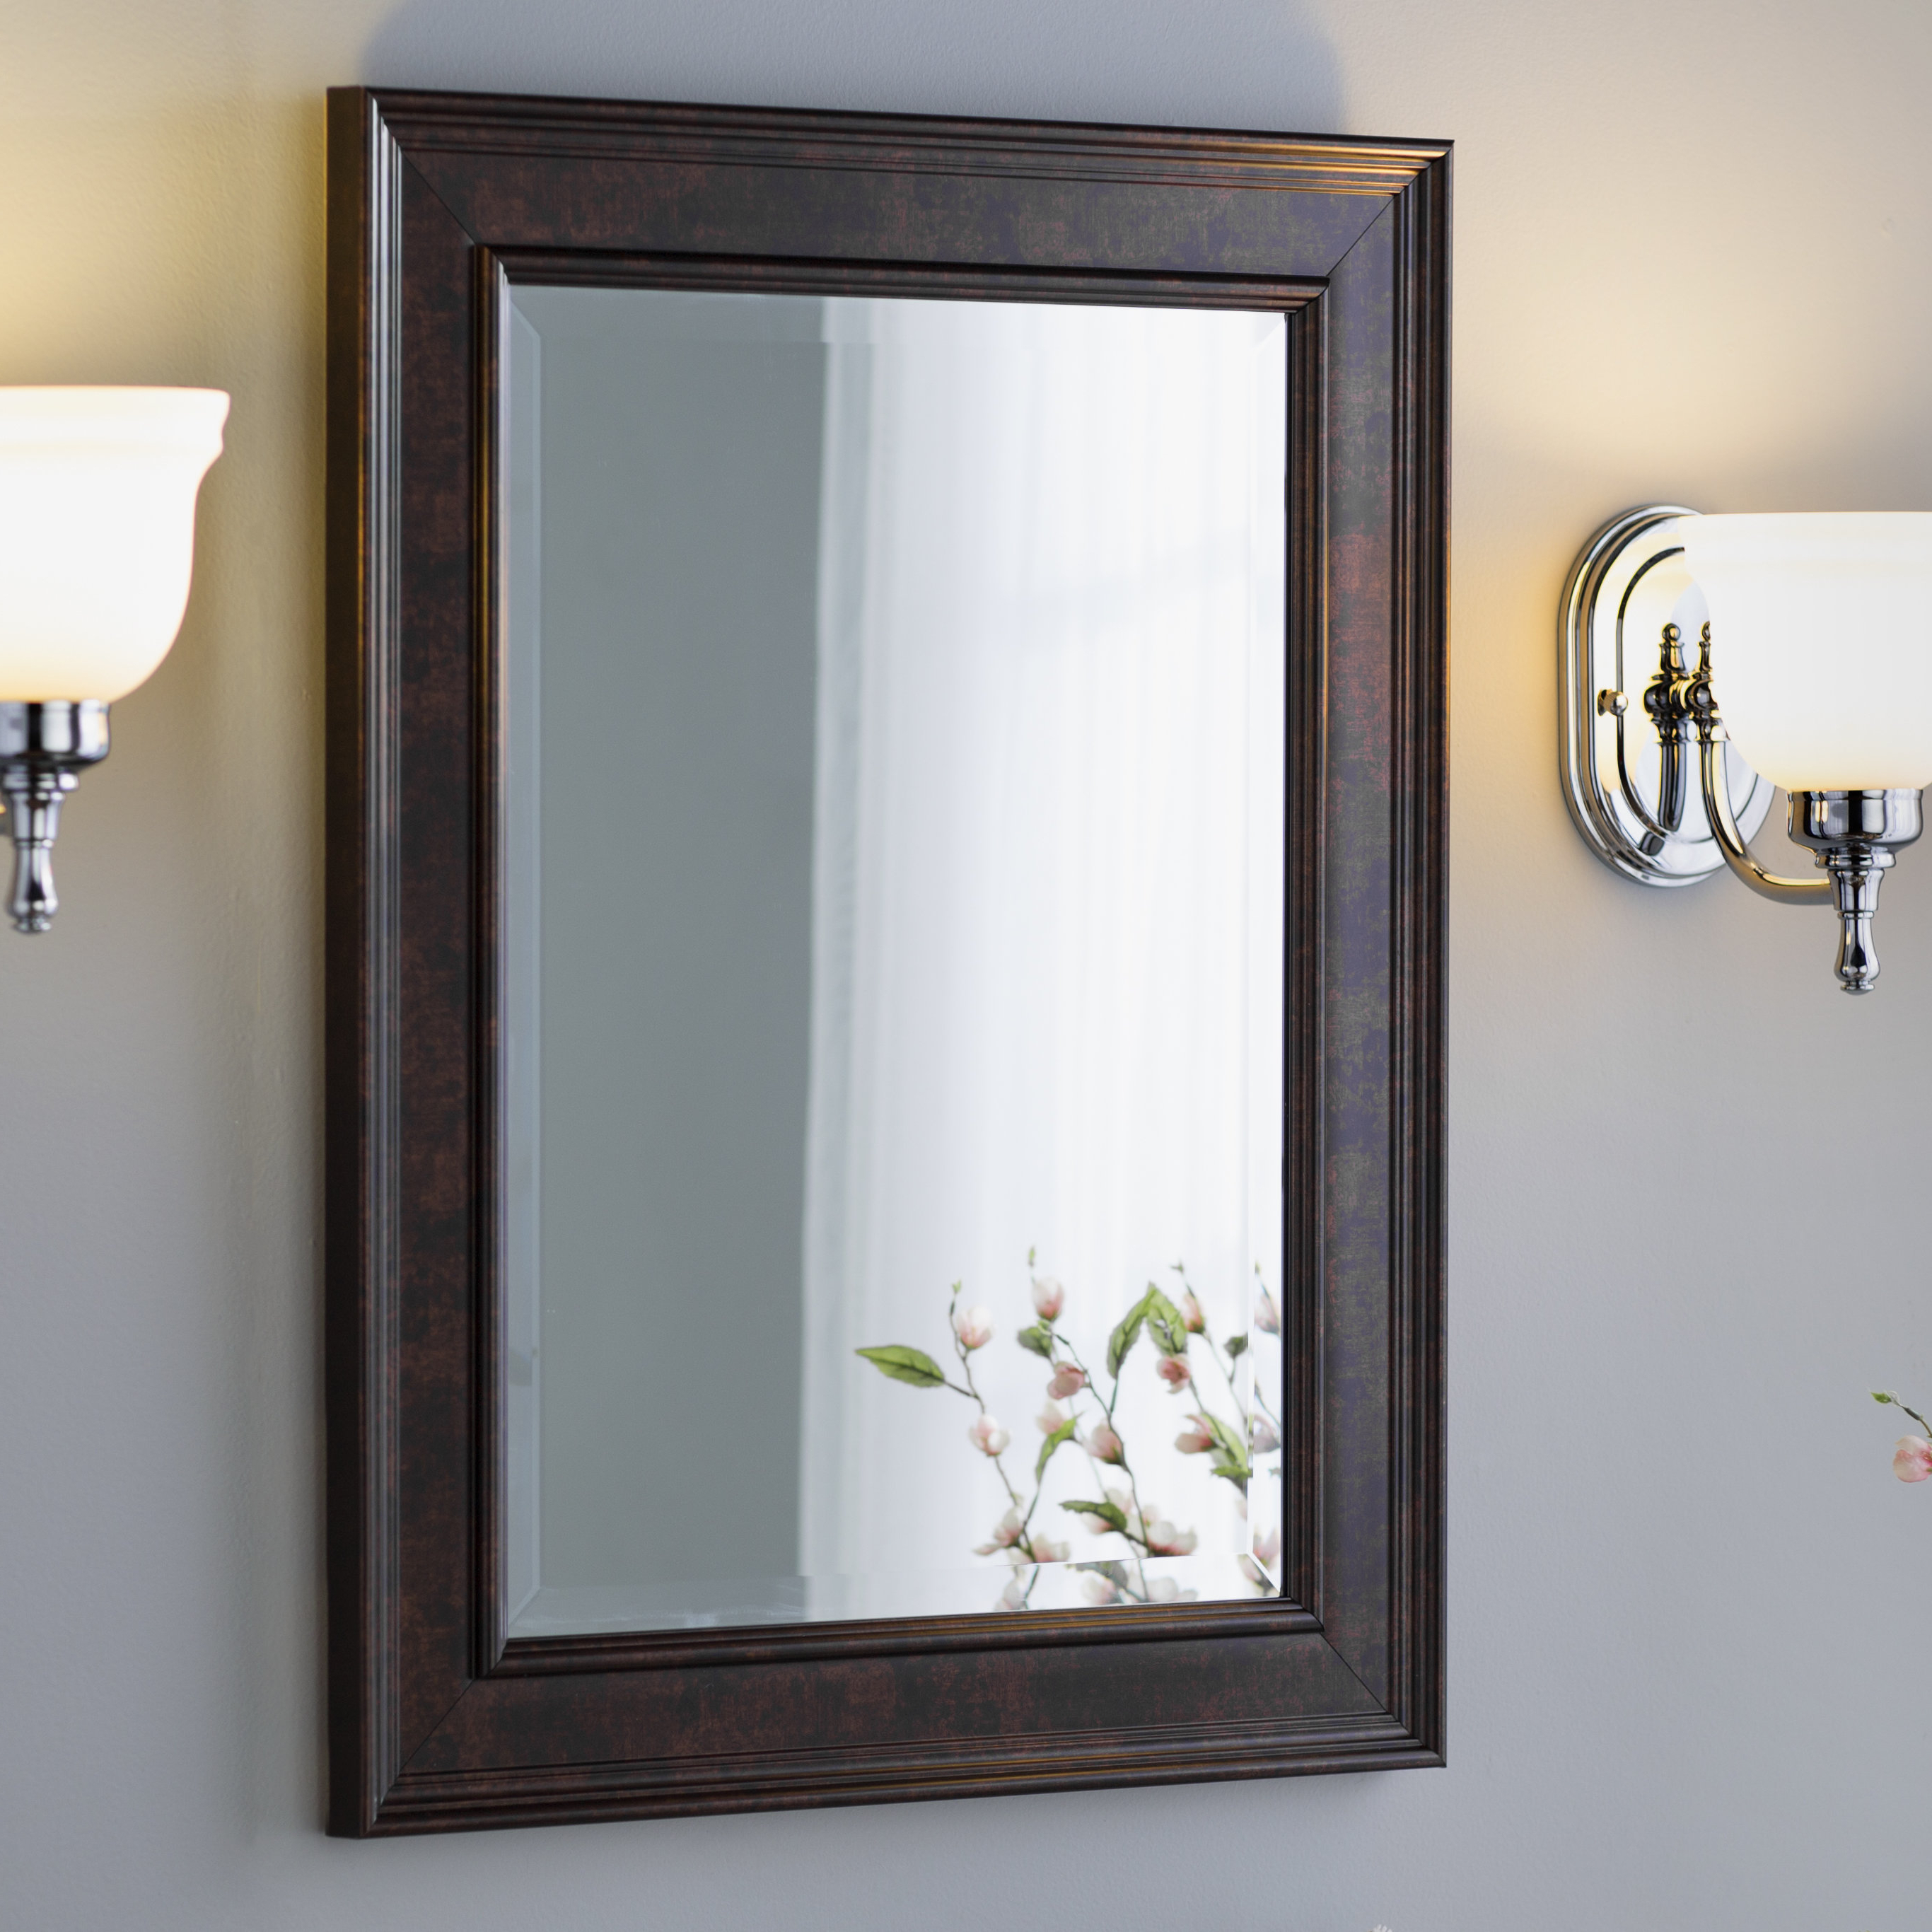 Traditional Beveled Wall Mirror Regarding Latest Vassallo Beaded Bronze Beveled Wall Mirrors (Gallery 4 of 20)